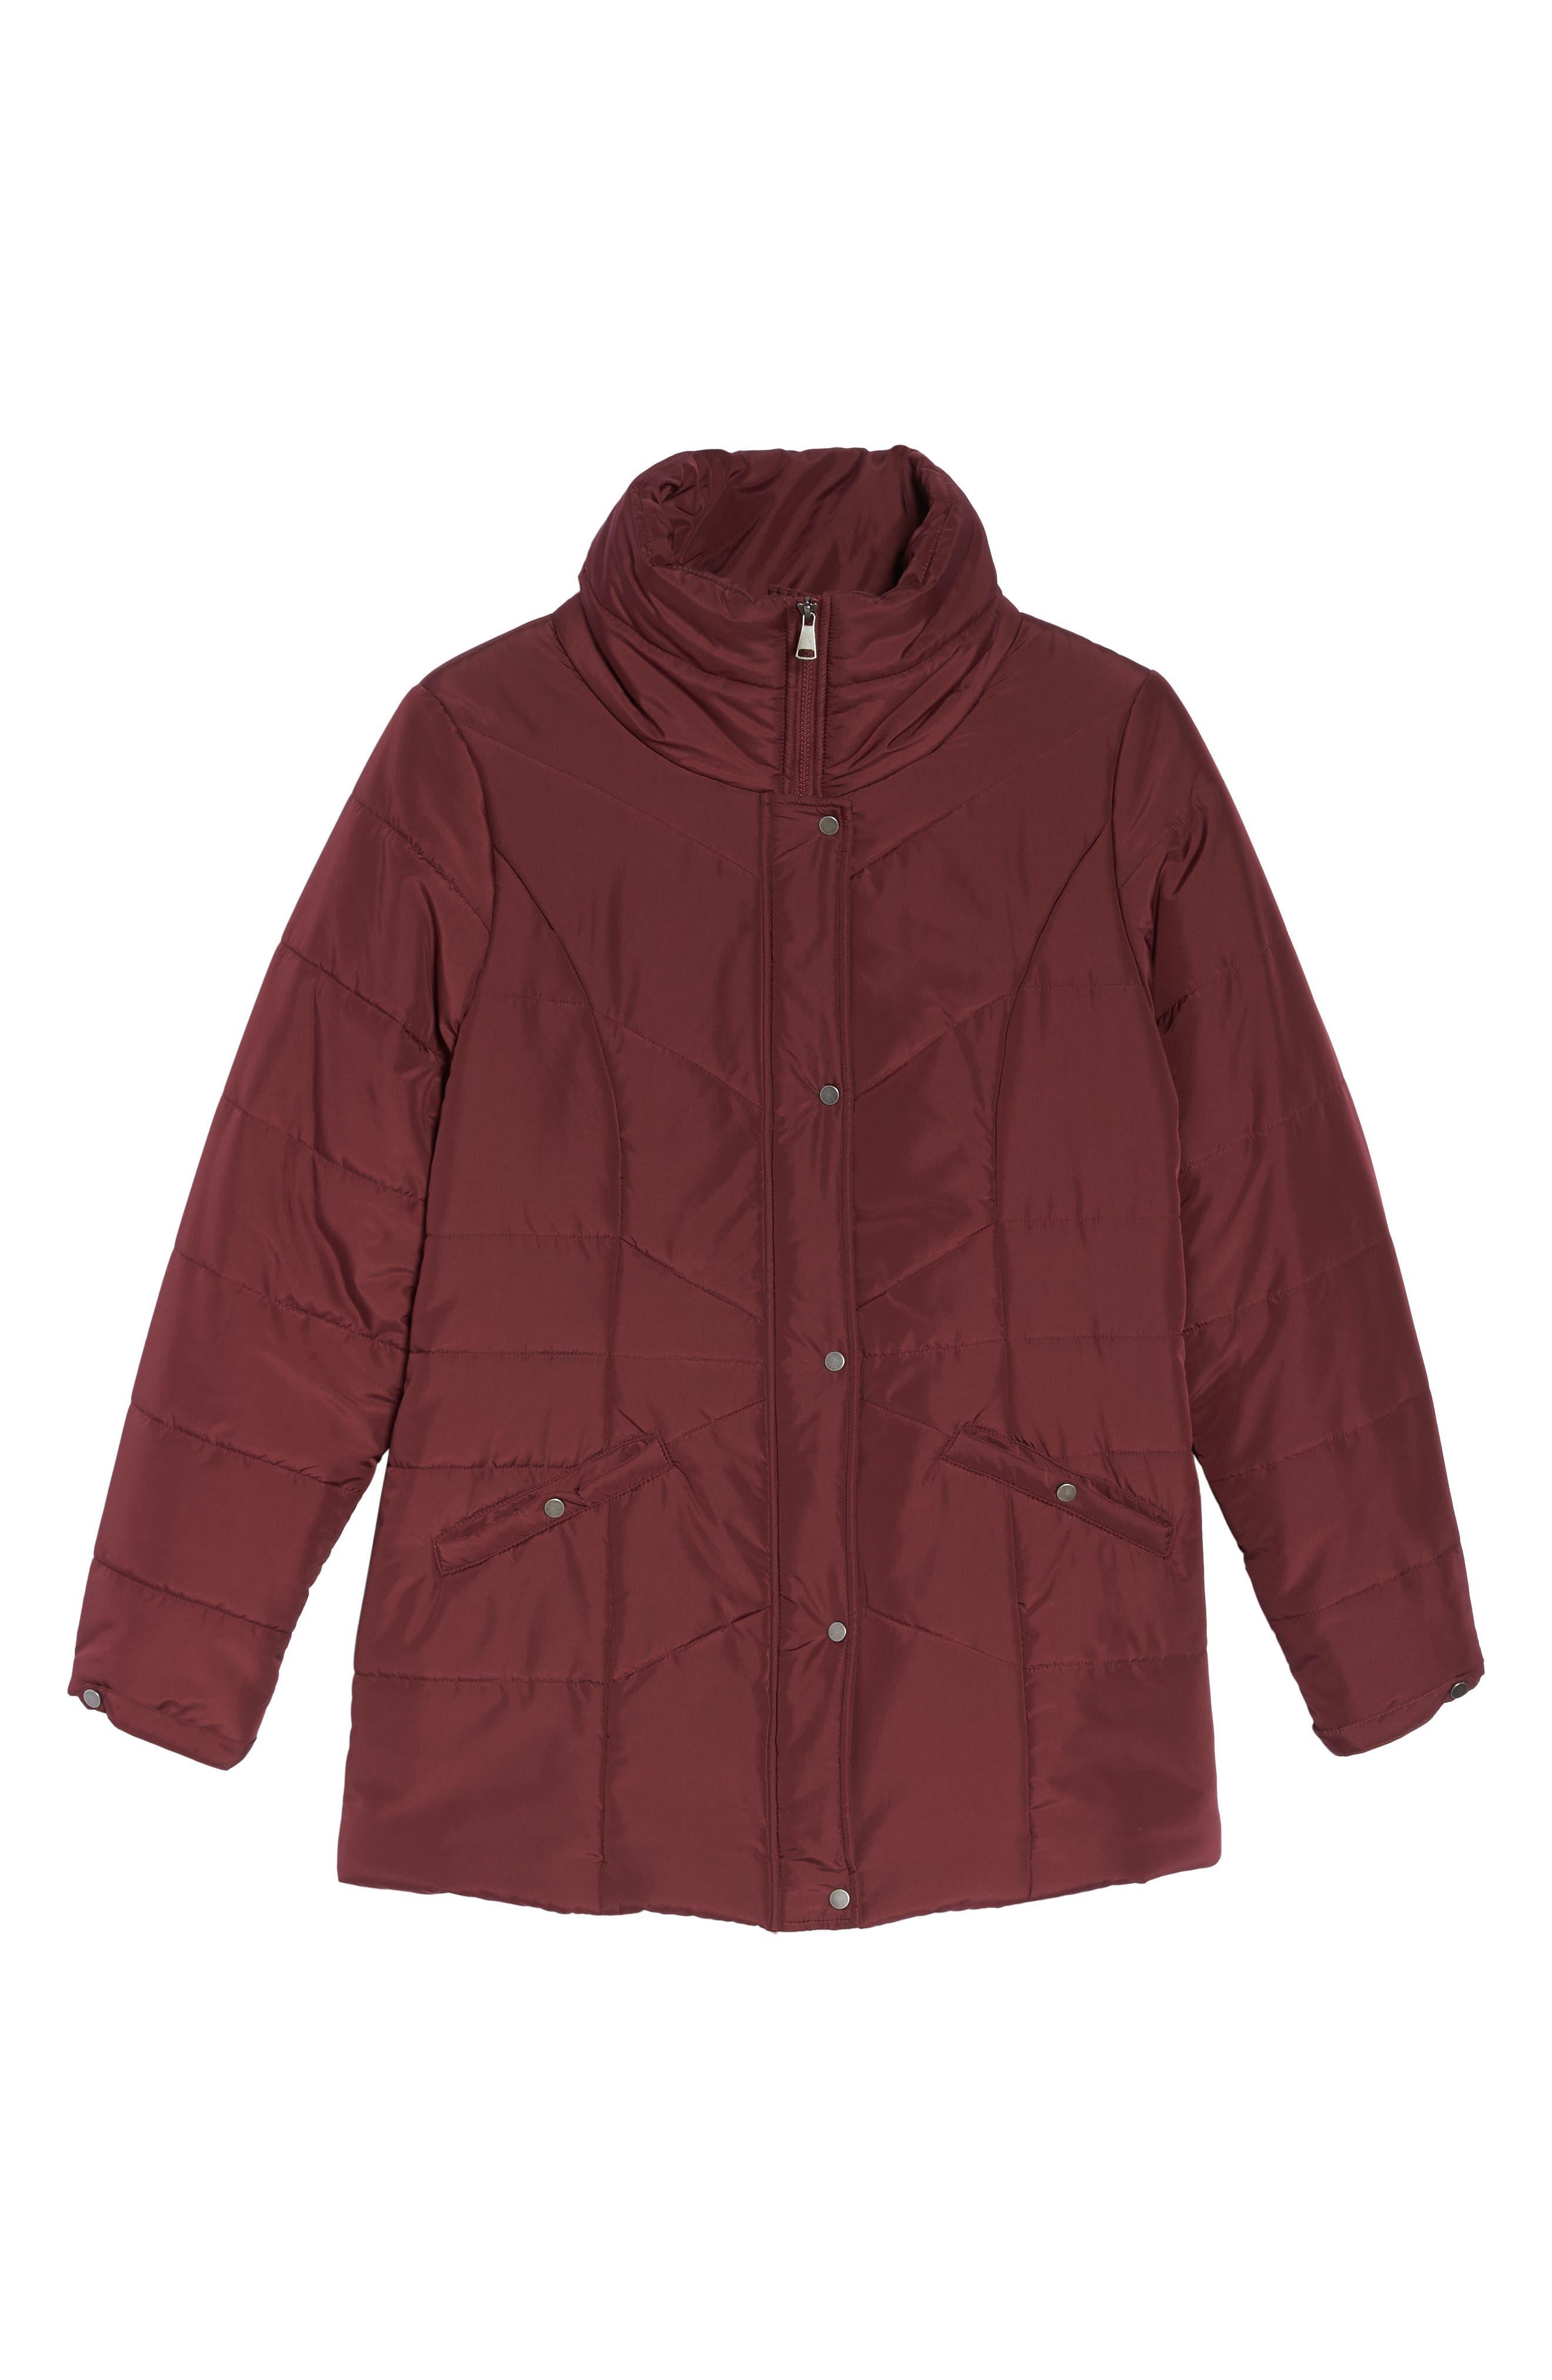 Valsi Puffer Jacket,                             Alternate thumbnail 5, color,